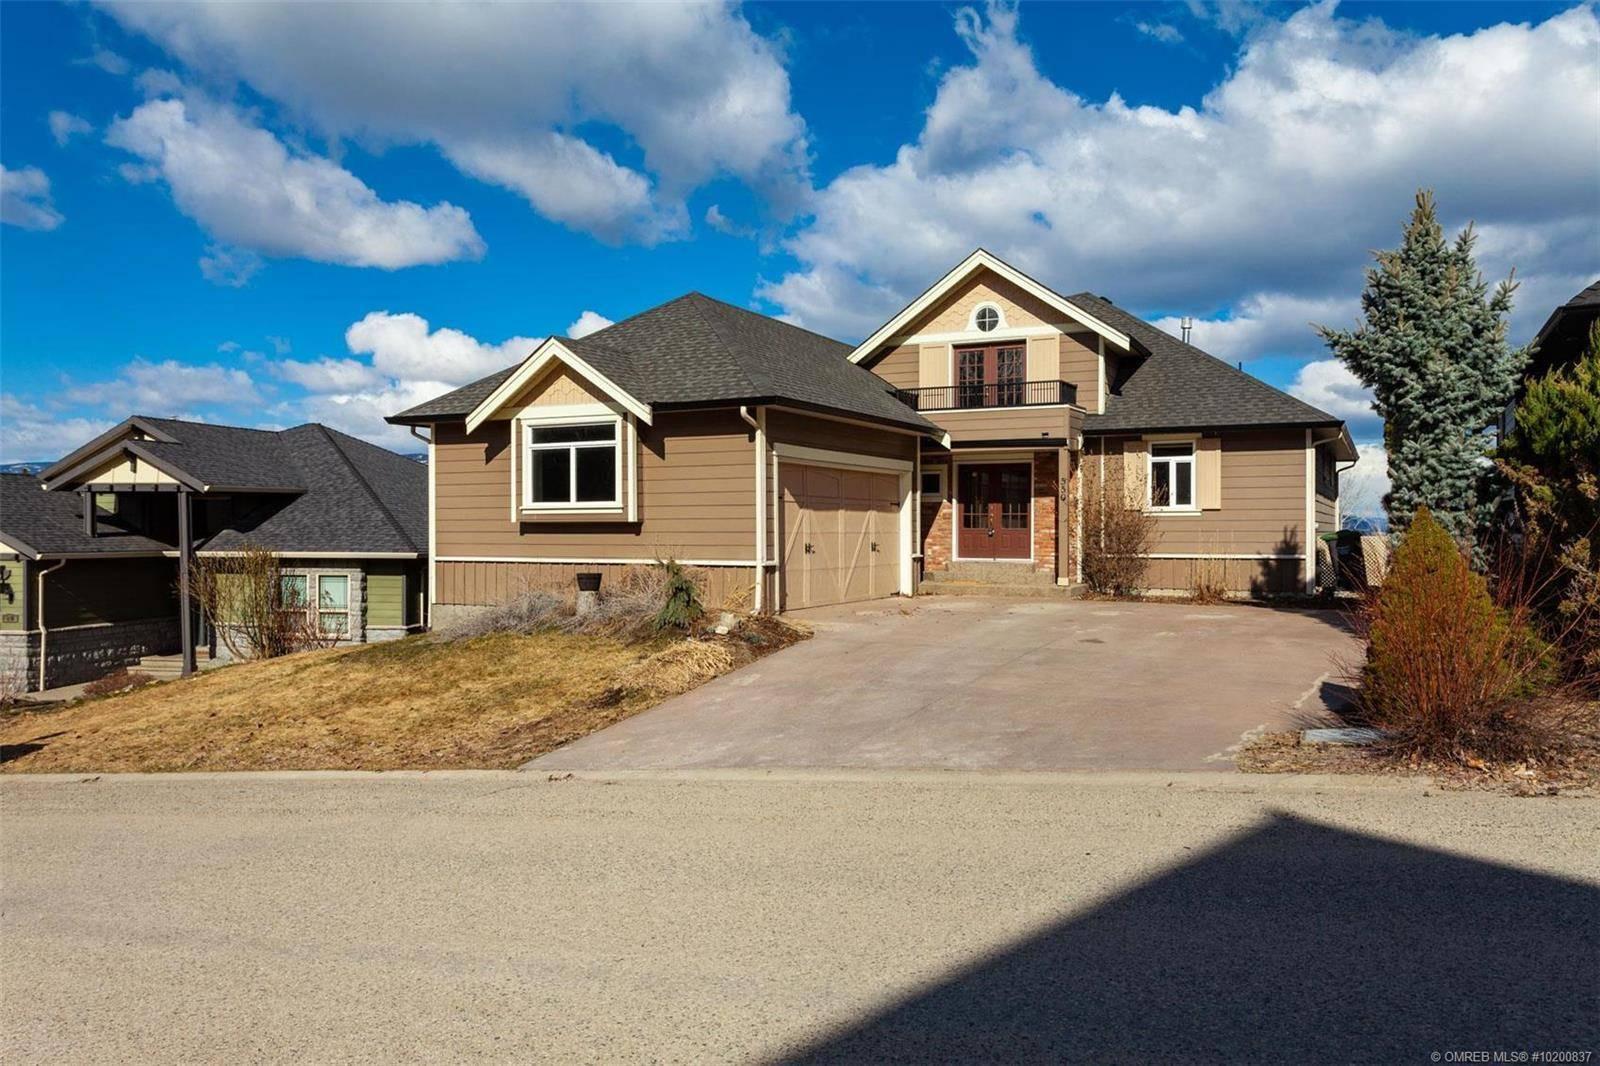 House for sale at 550 Gowen Pl Kelowna British Columbia - MLS: 10200837